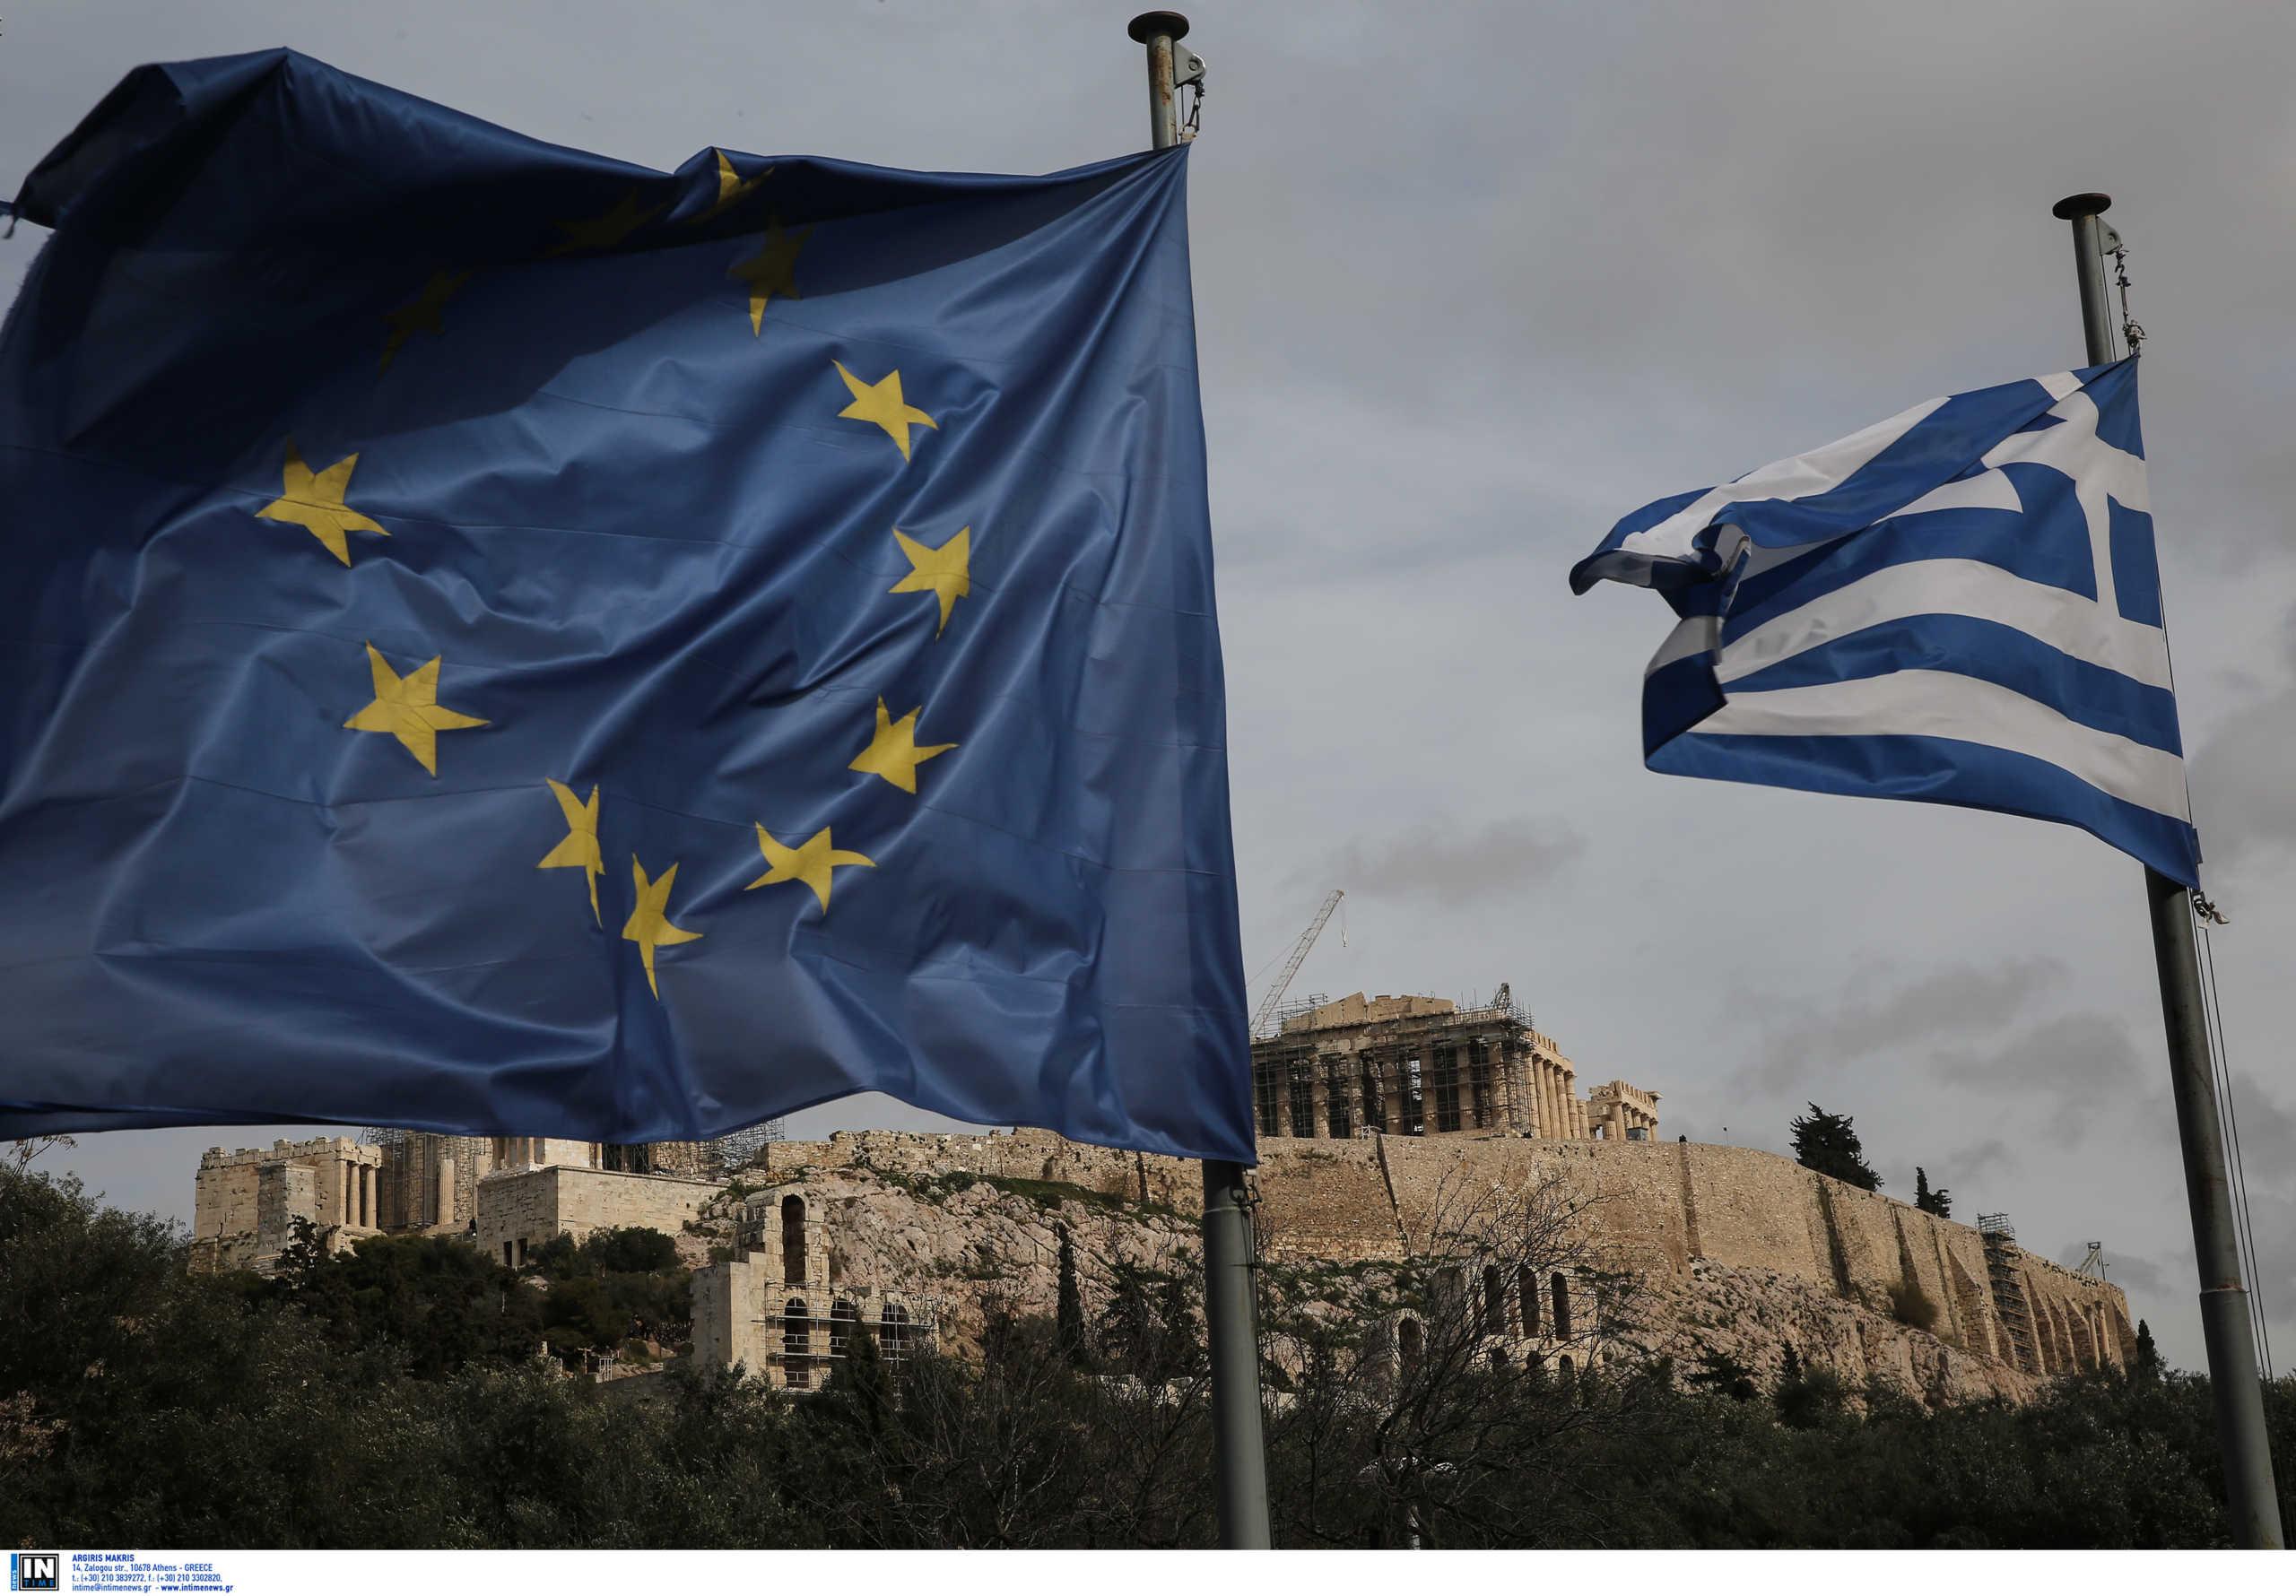 Der Standard: Πρότυπο η Ελλάδα ως προς το σχέδιο του Ευρωπαϊκού Ταμείου Ανάπτυξης